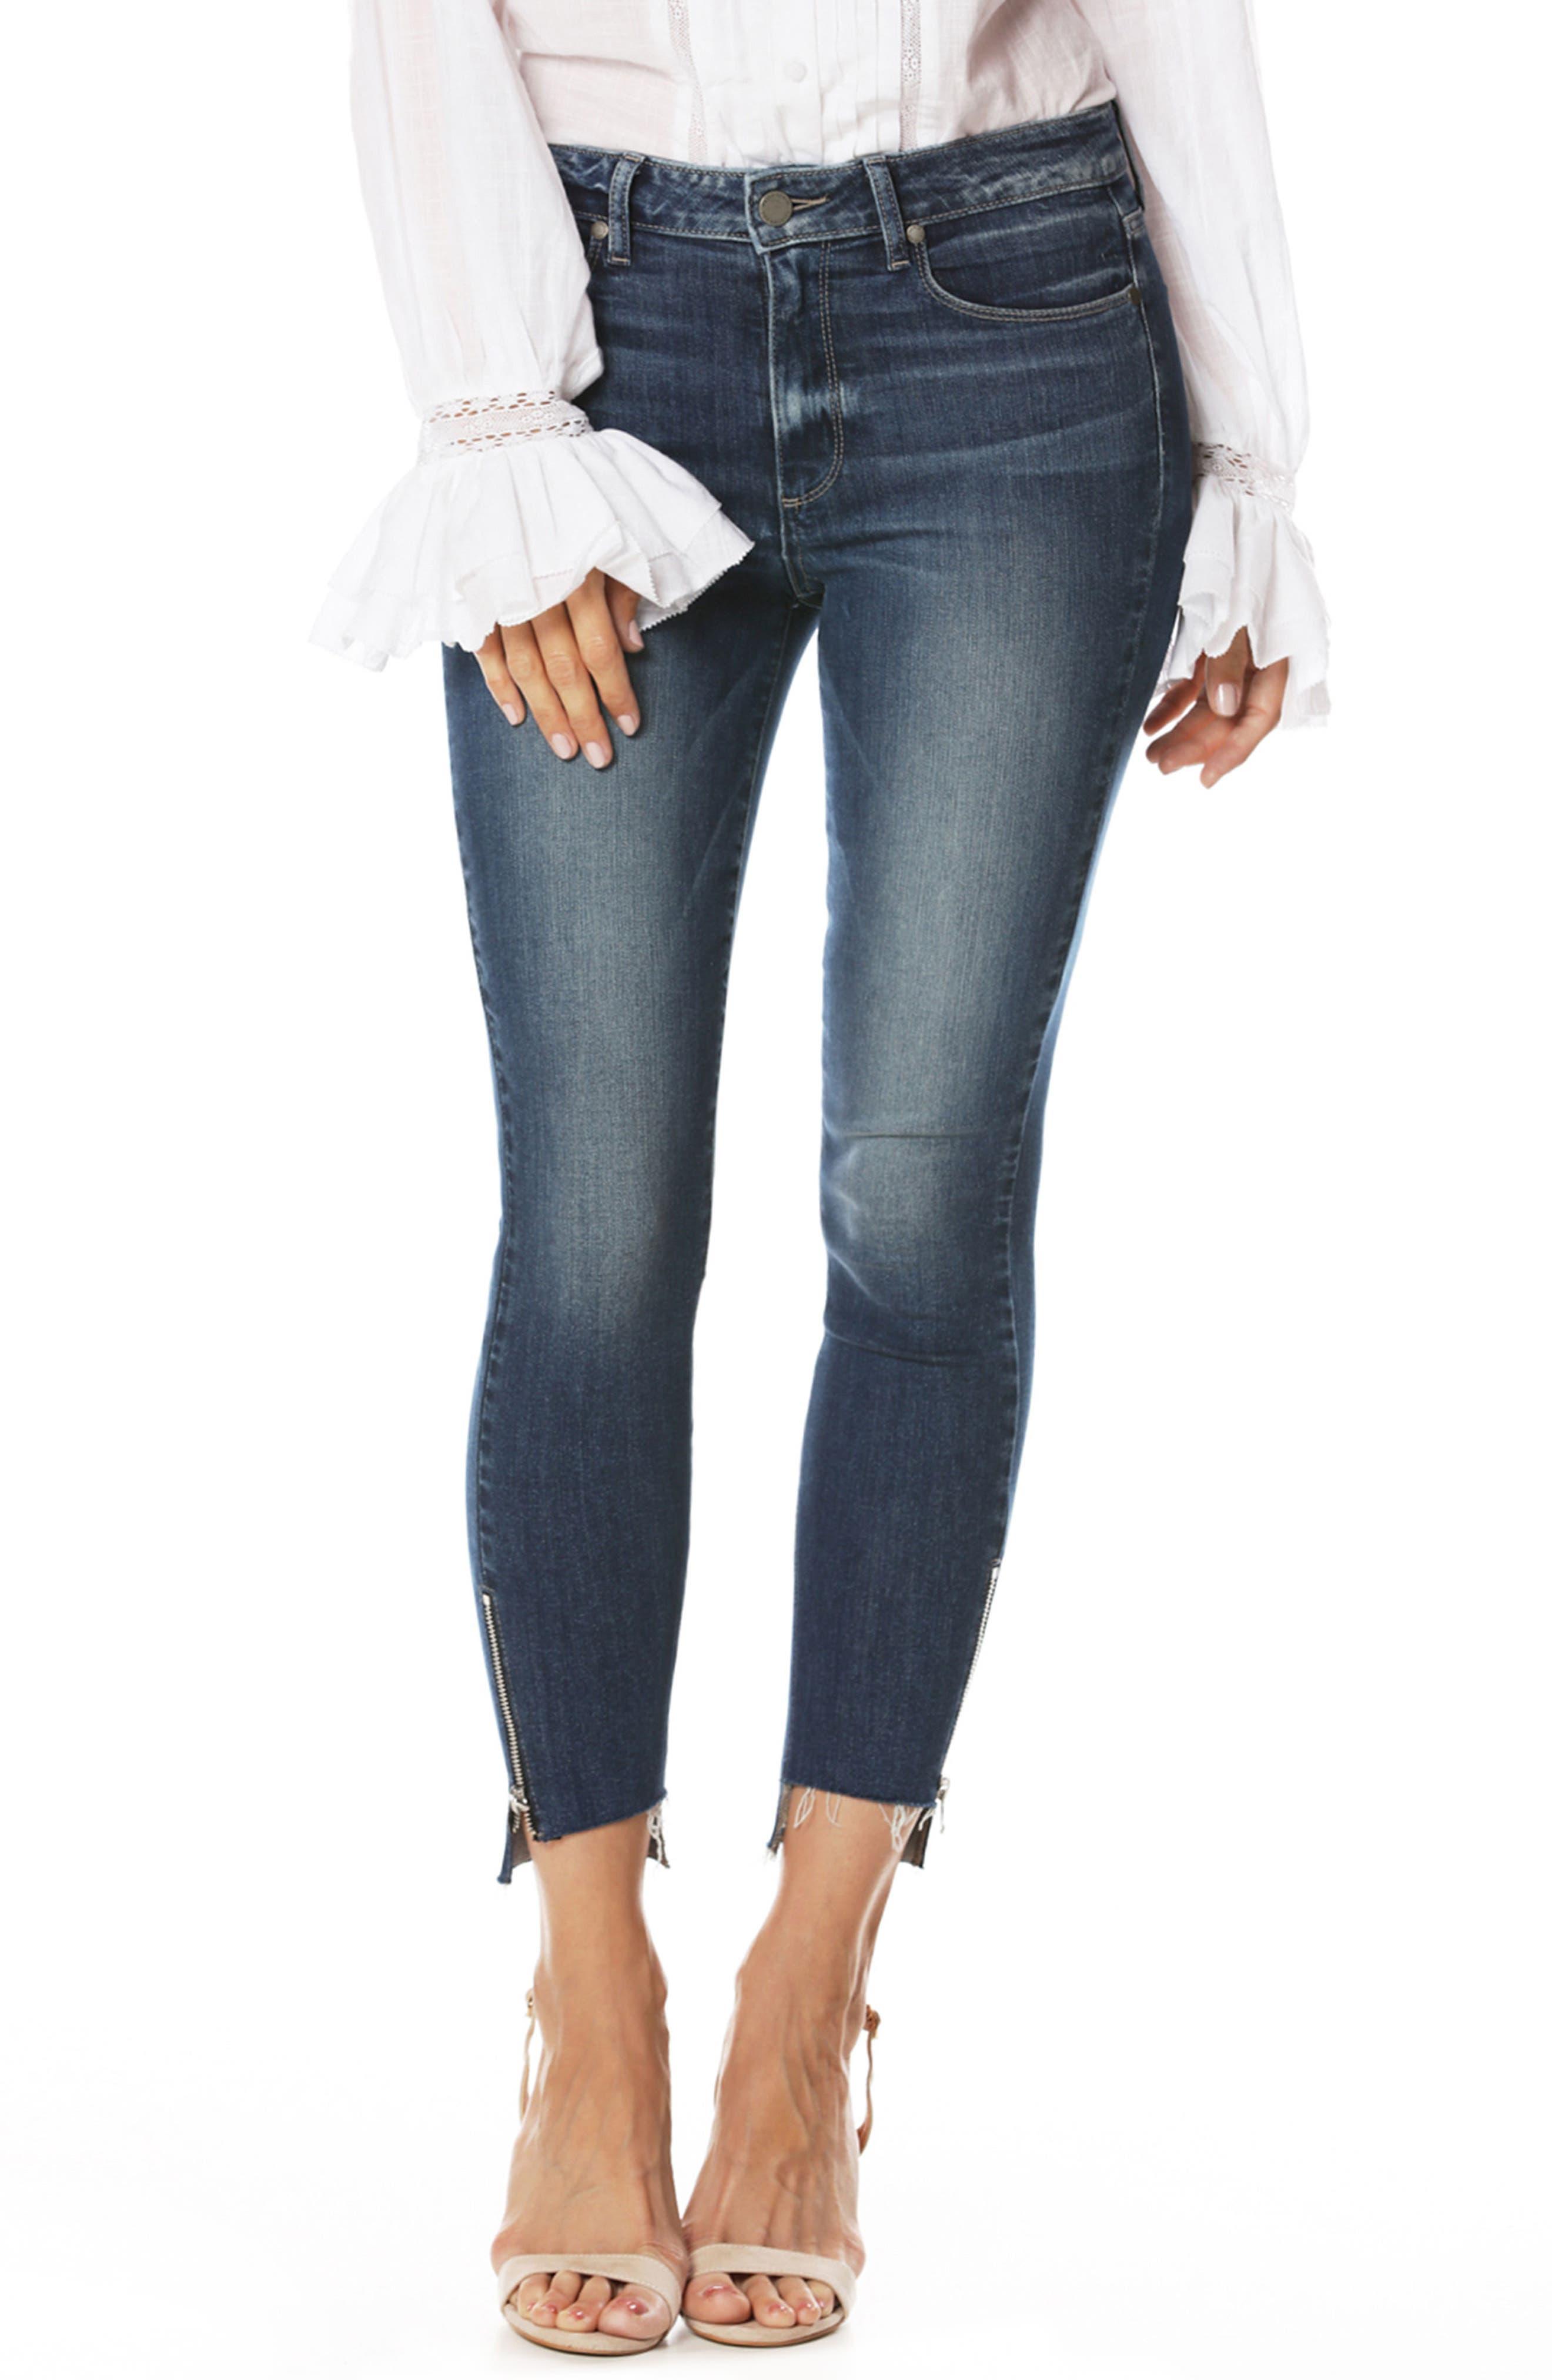 Alternate Image 1 Selected - PAIGE Transcend Vintage - Hoxton High Waist Ankle Straight Leg Jeans (Malibu)